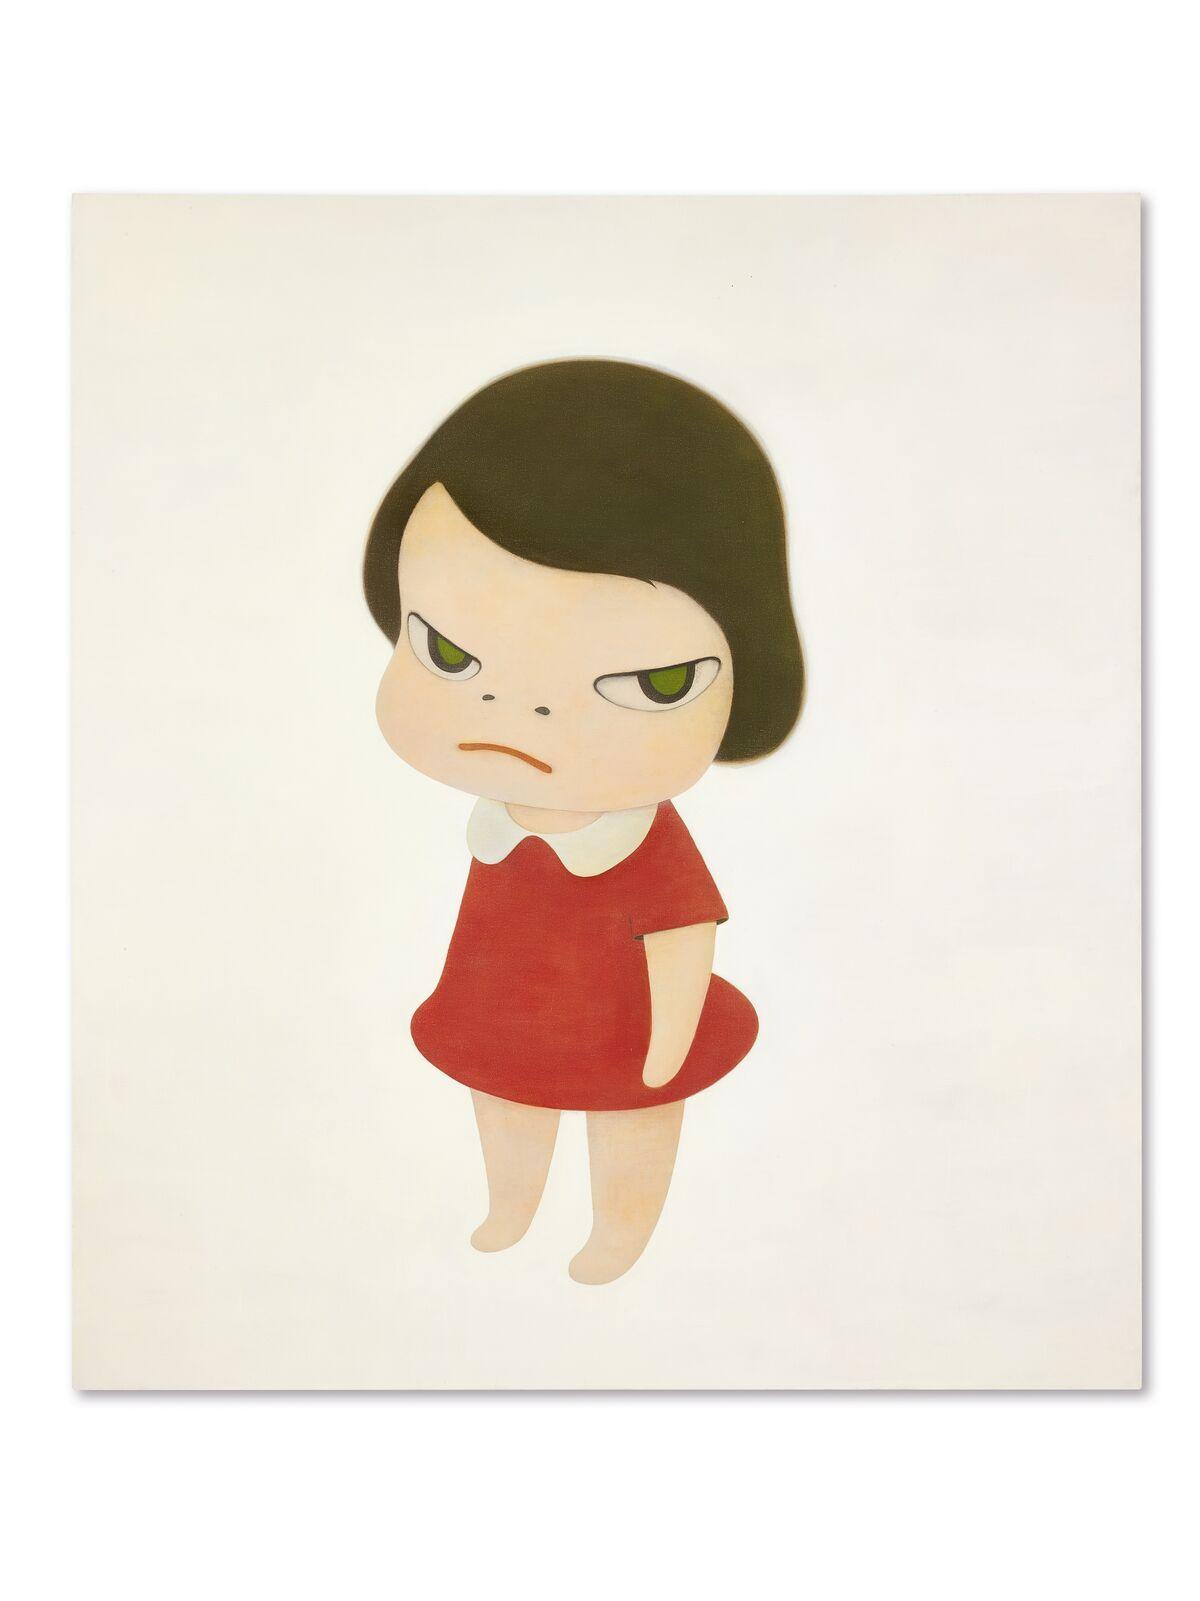 Yoshitomo Nara, Knife Behind Back, 2000. Courtesy Sotheby's.